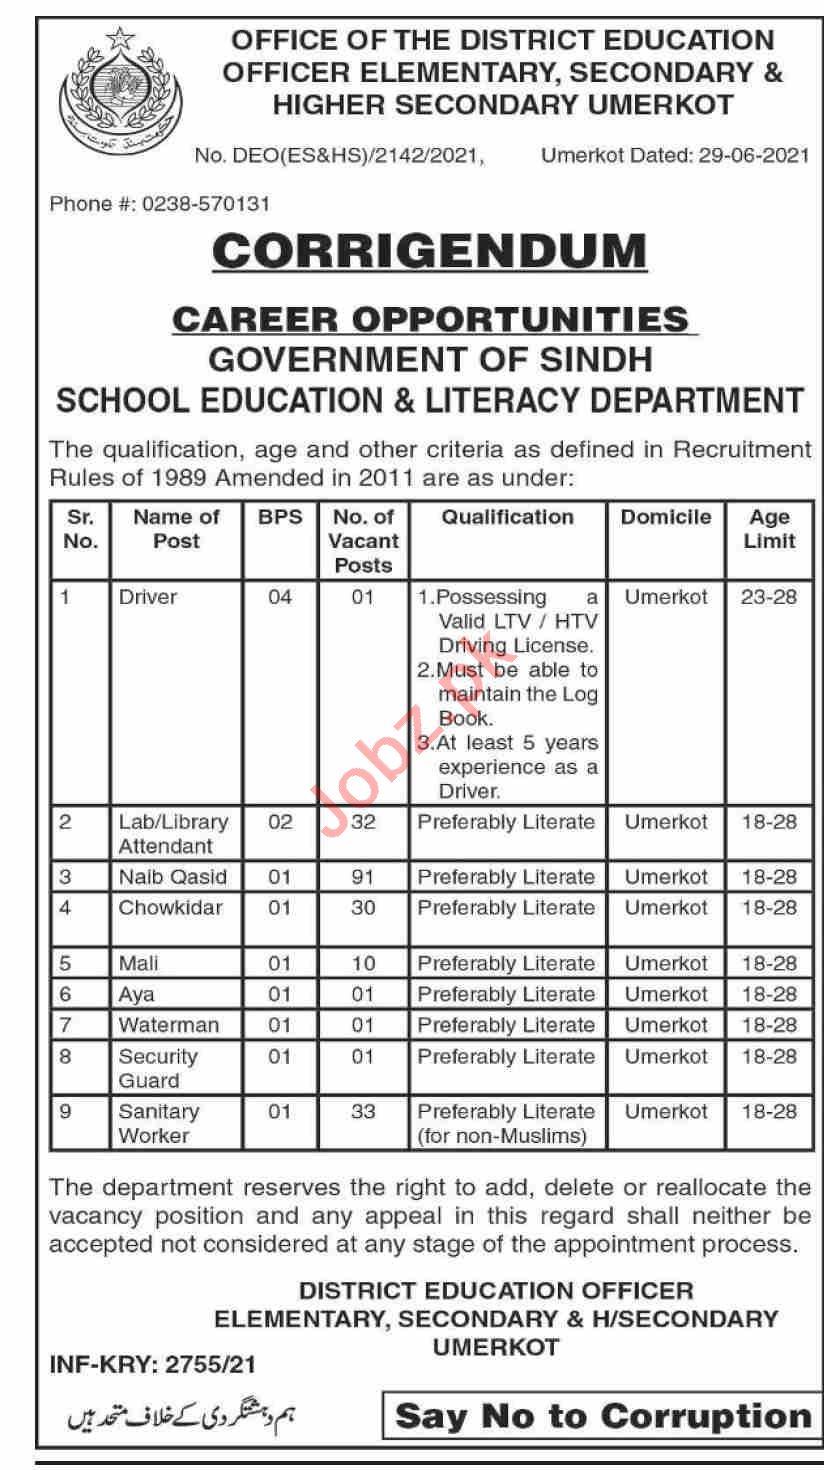 School Education & Literacy Department Umerkot Jobs 2021 in Pakistan